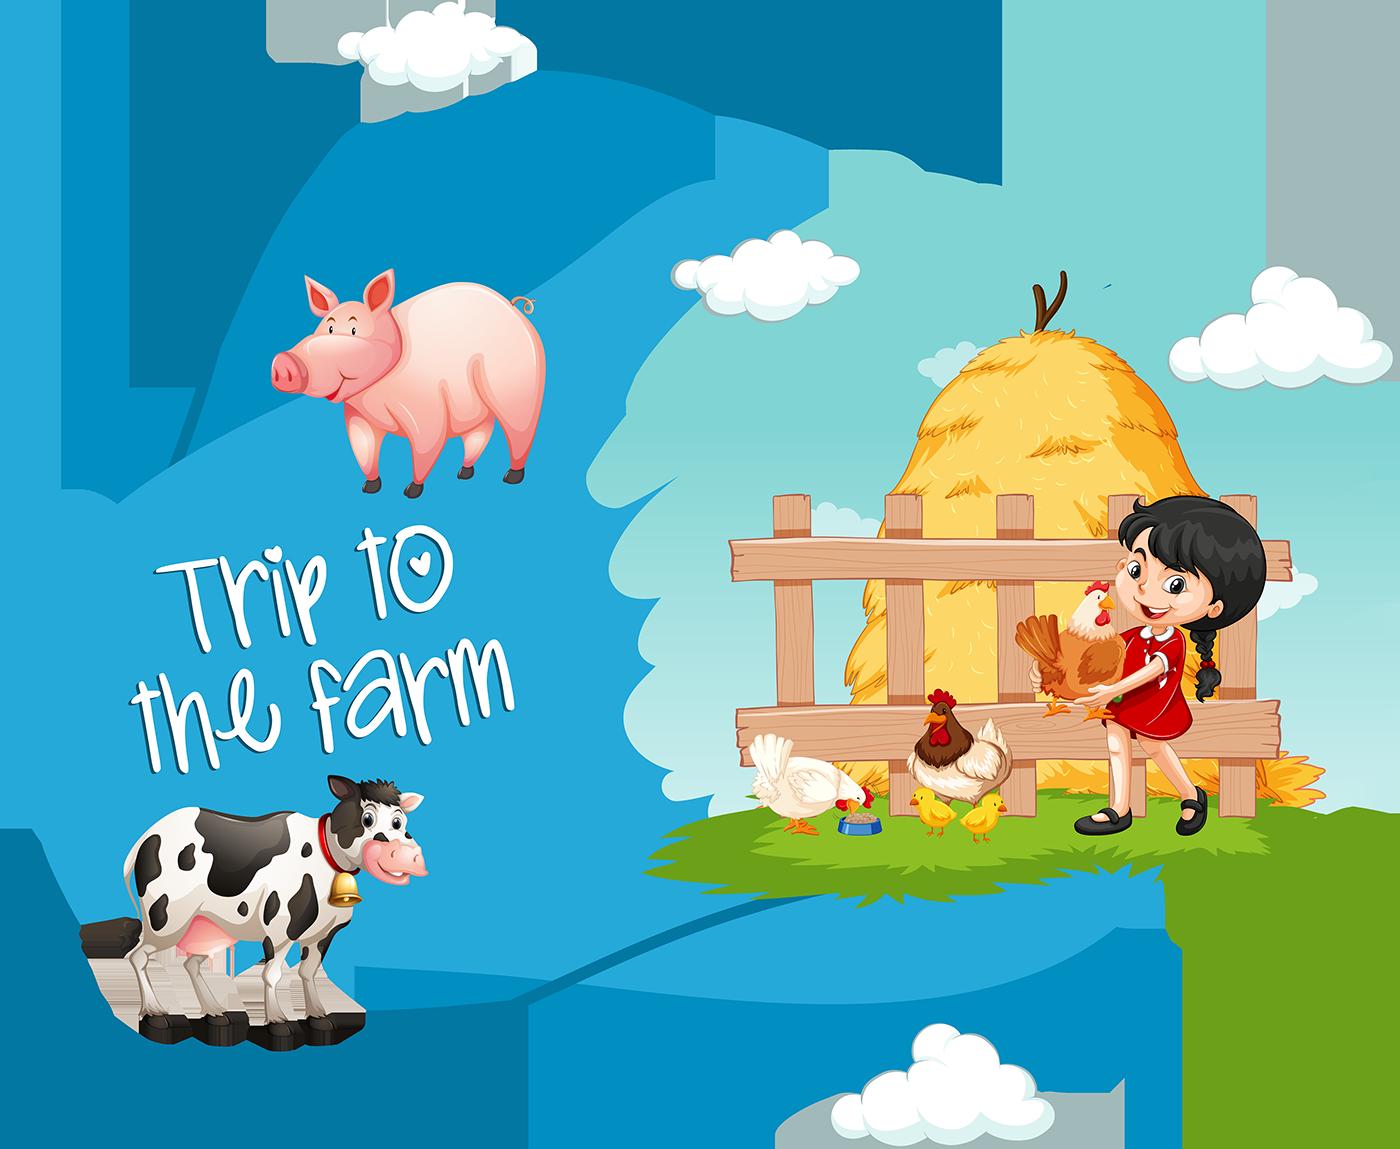 Trip to the farm